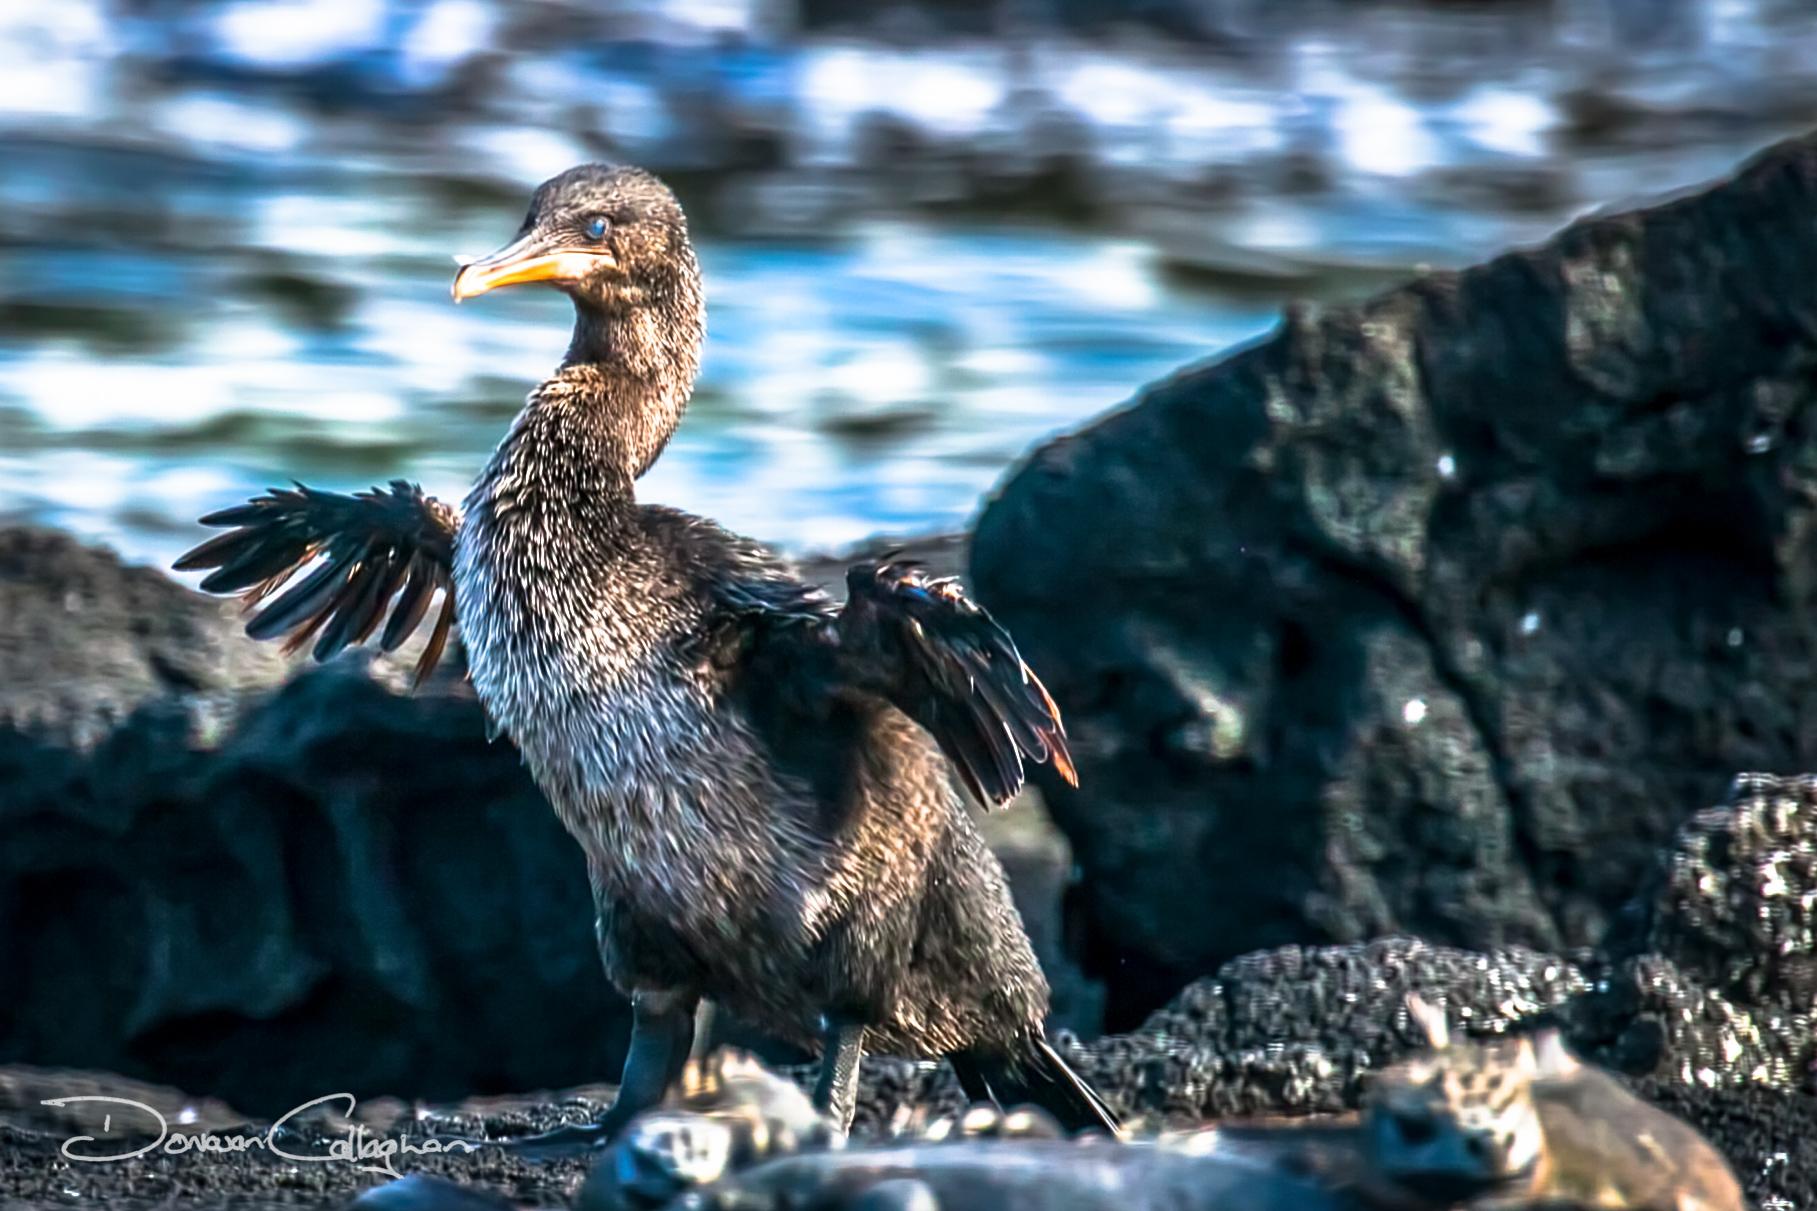 The flightless cormorant Galapagos Islands, Ecuador